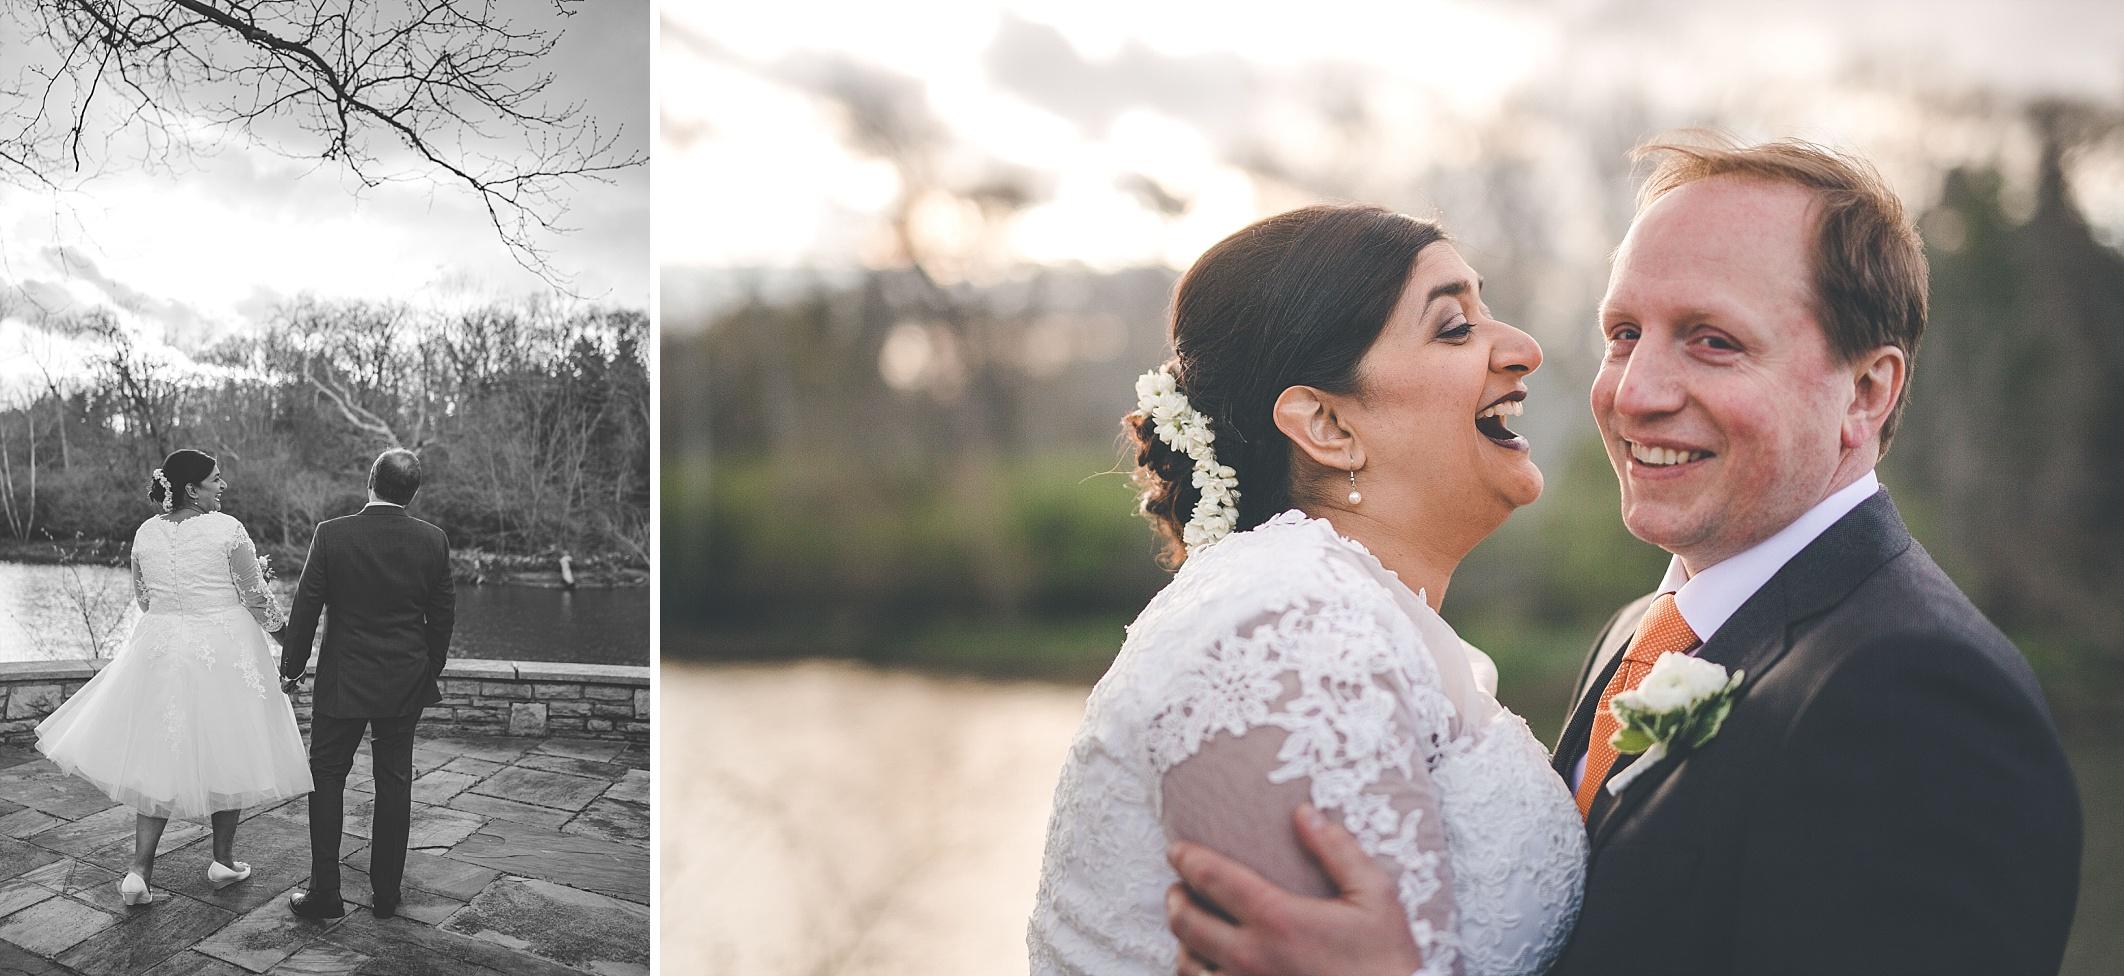 2716_dayton-indian-wedding-photographer-beavercreek_0071.jpg